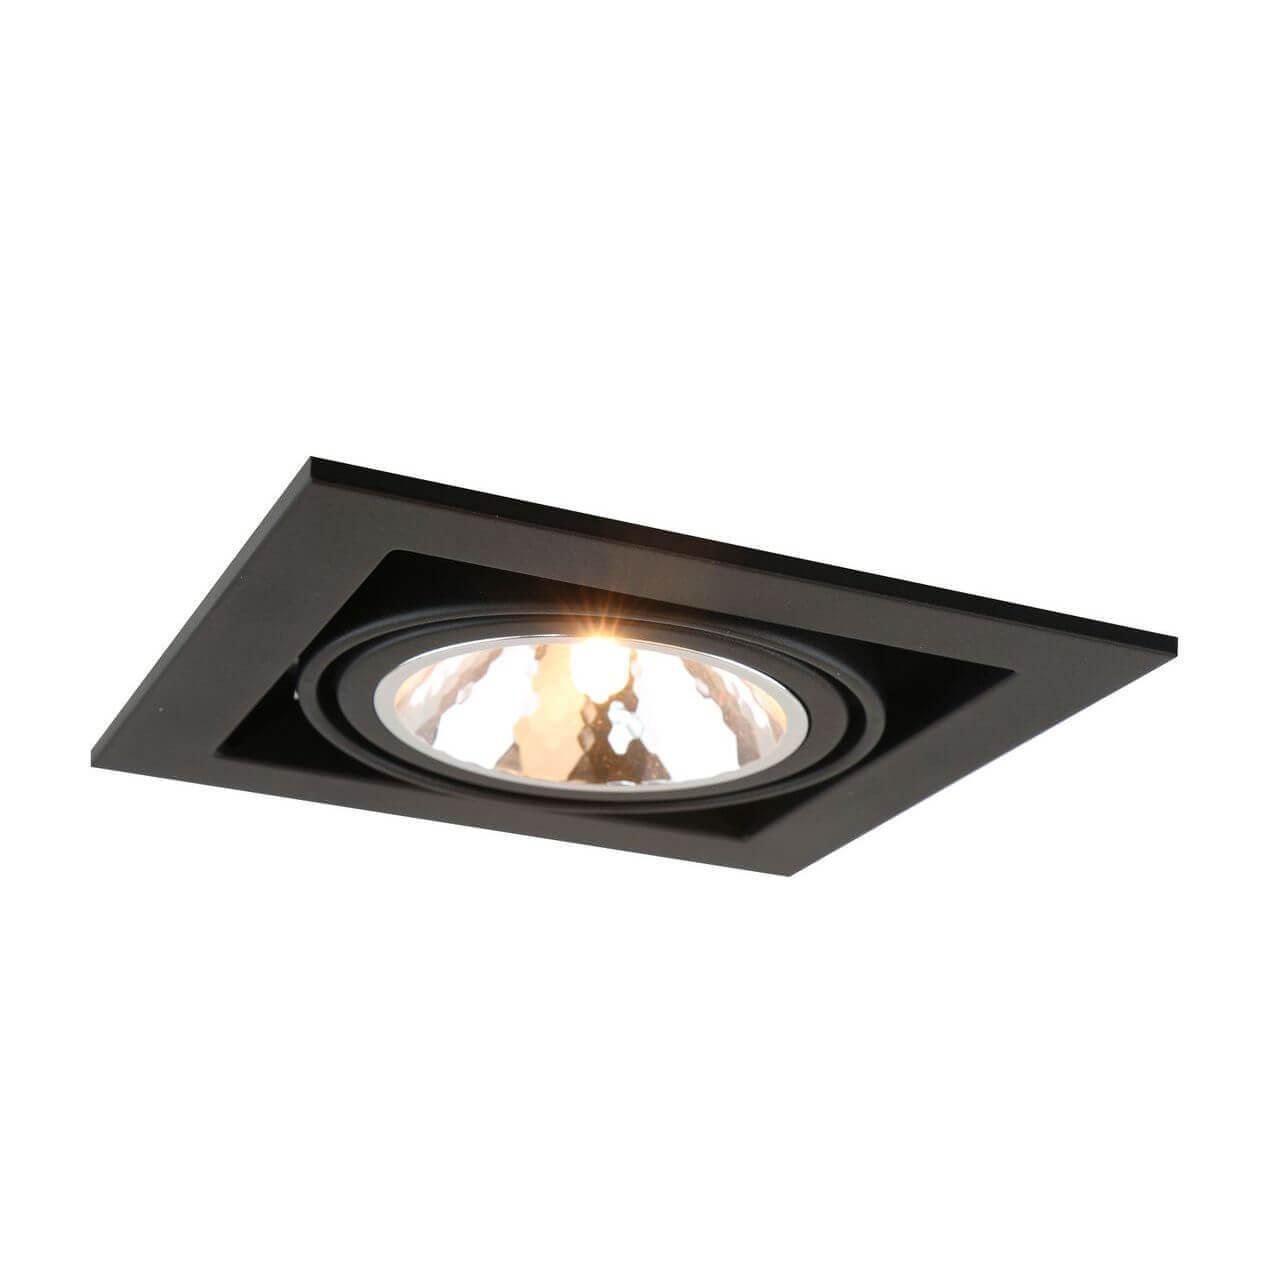 Светильник Arte Lamp A5949PL-1BK Cardani Semplice BK